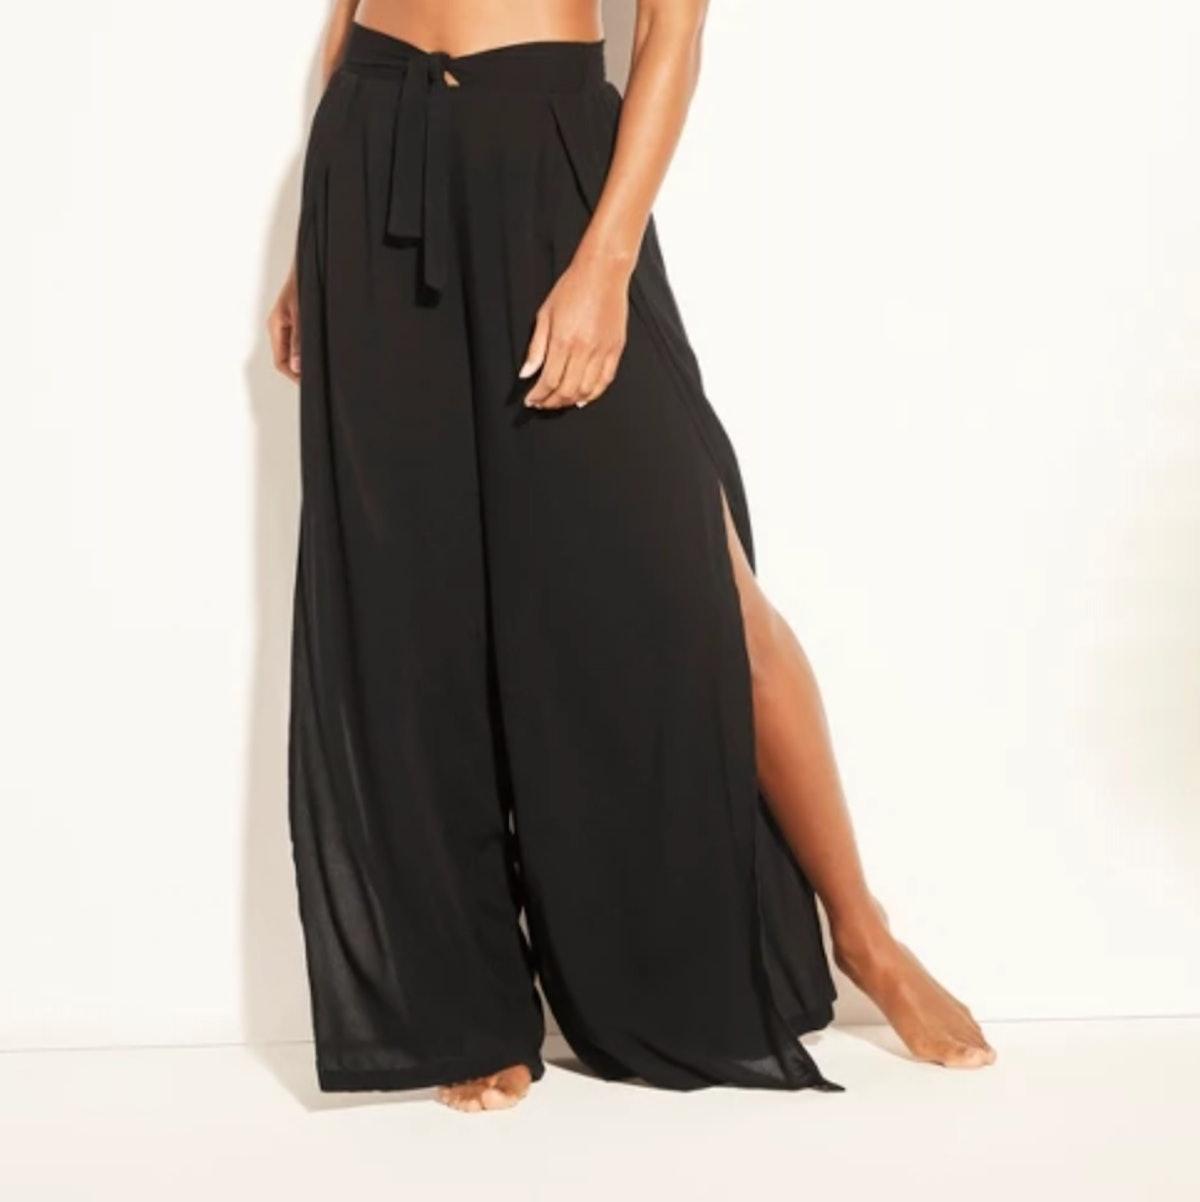 Tie Waist Beach Cover Up Pants